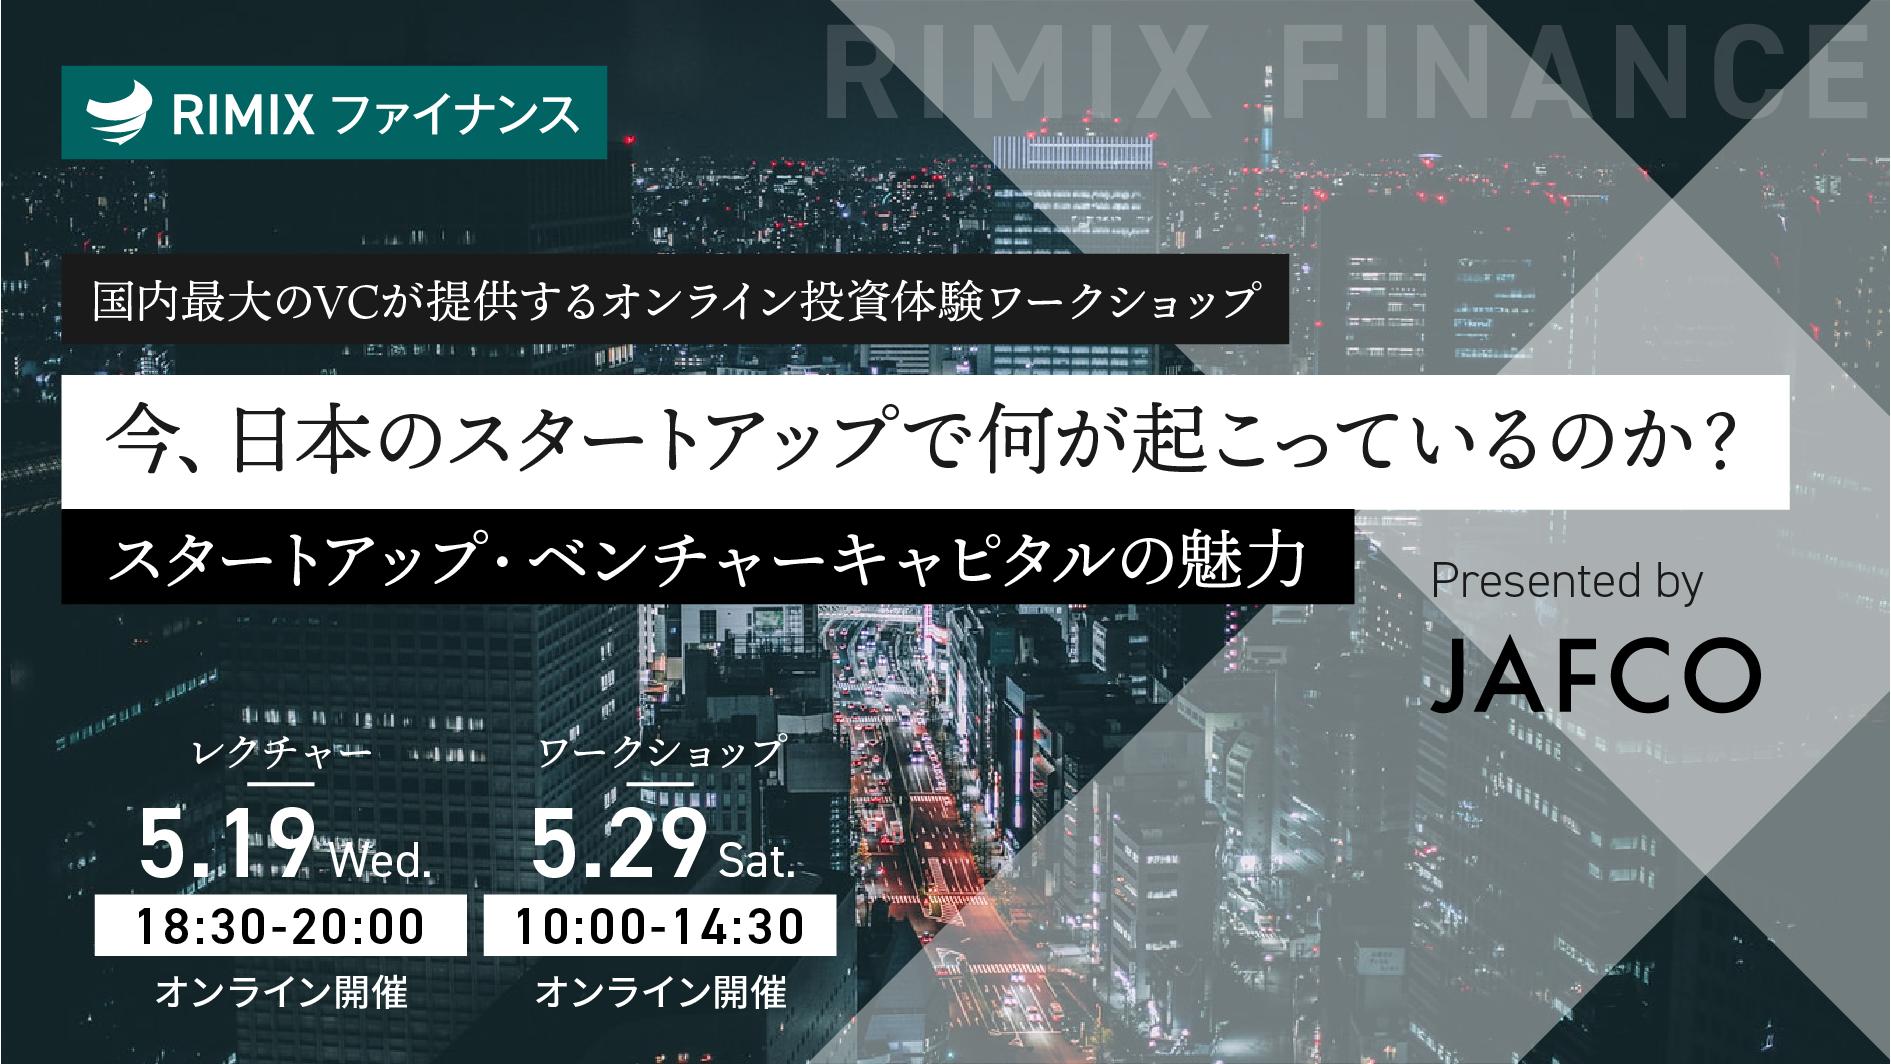 【RIMIXファイナンス】「今、日本のスタートアップで何が起こっているのか?」 スタートアップ・ベンチャーキャピタルの魅力 Presented by JAFCO